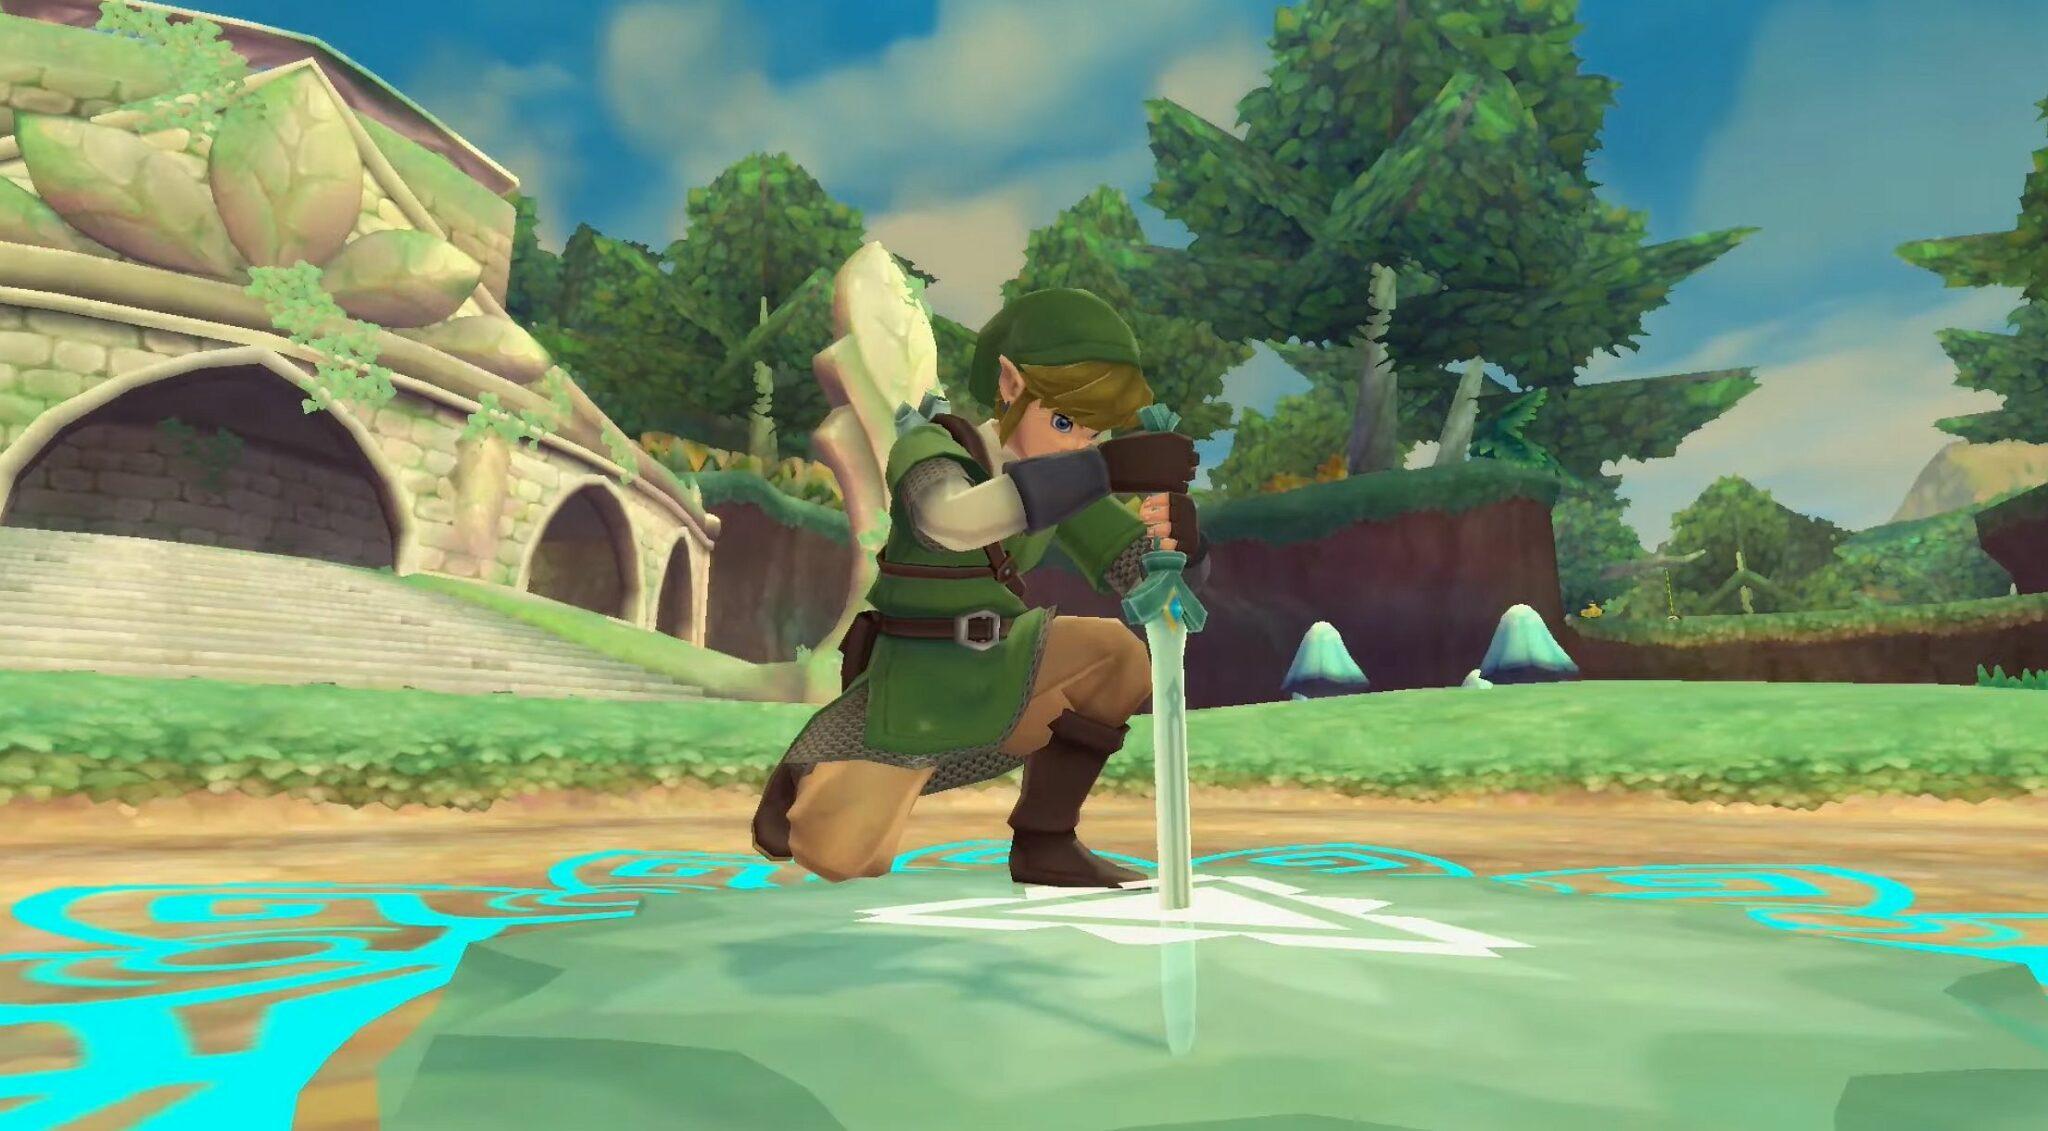 Critique du jeu The Legend of Zelda: Skyward Sword HD